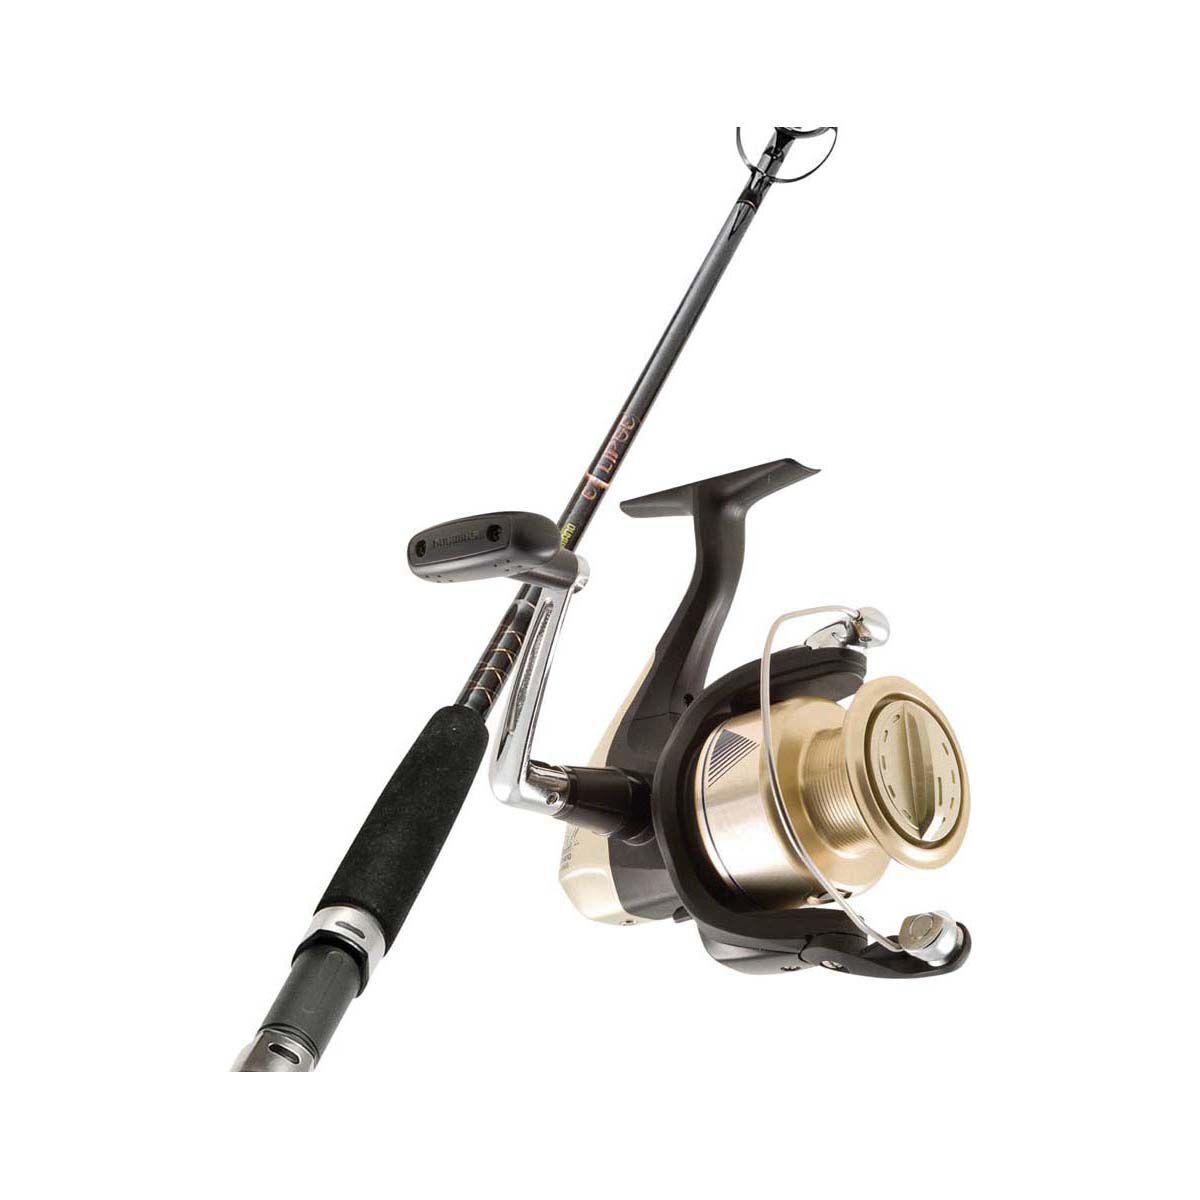 Mr Z 10 PCs Casting Fishing Rod Sleeve Rod Cover Pole Sock Jacket